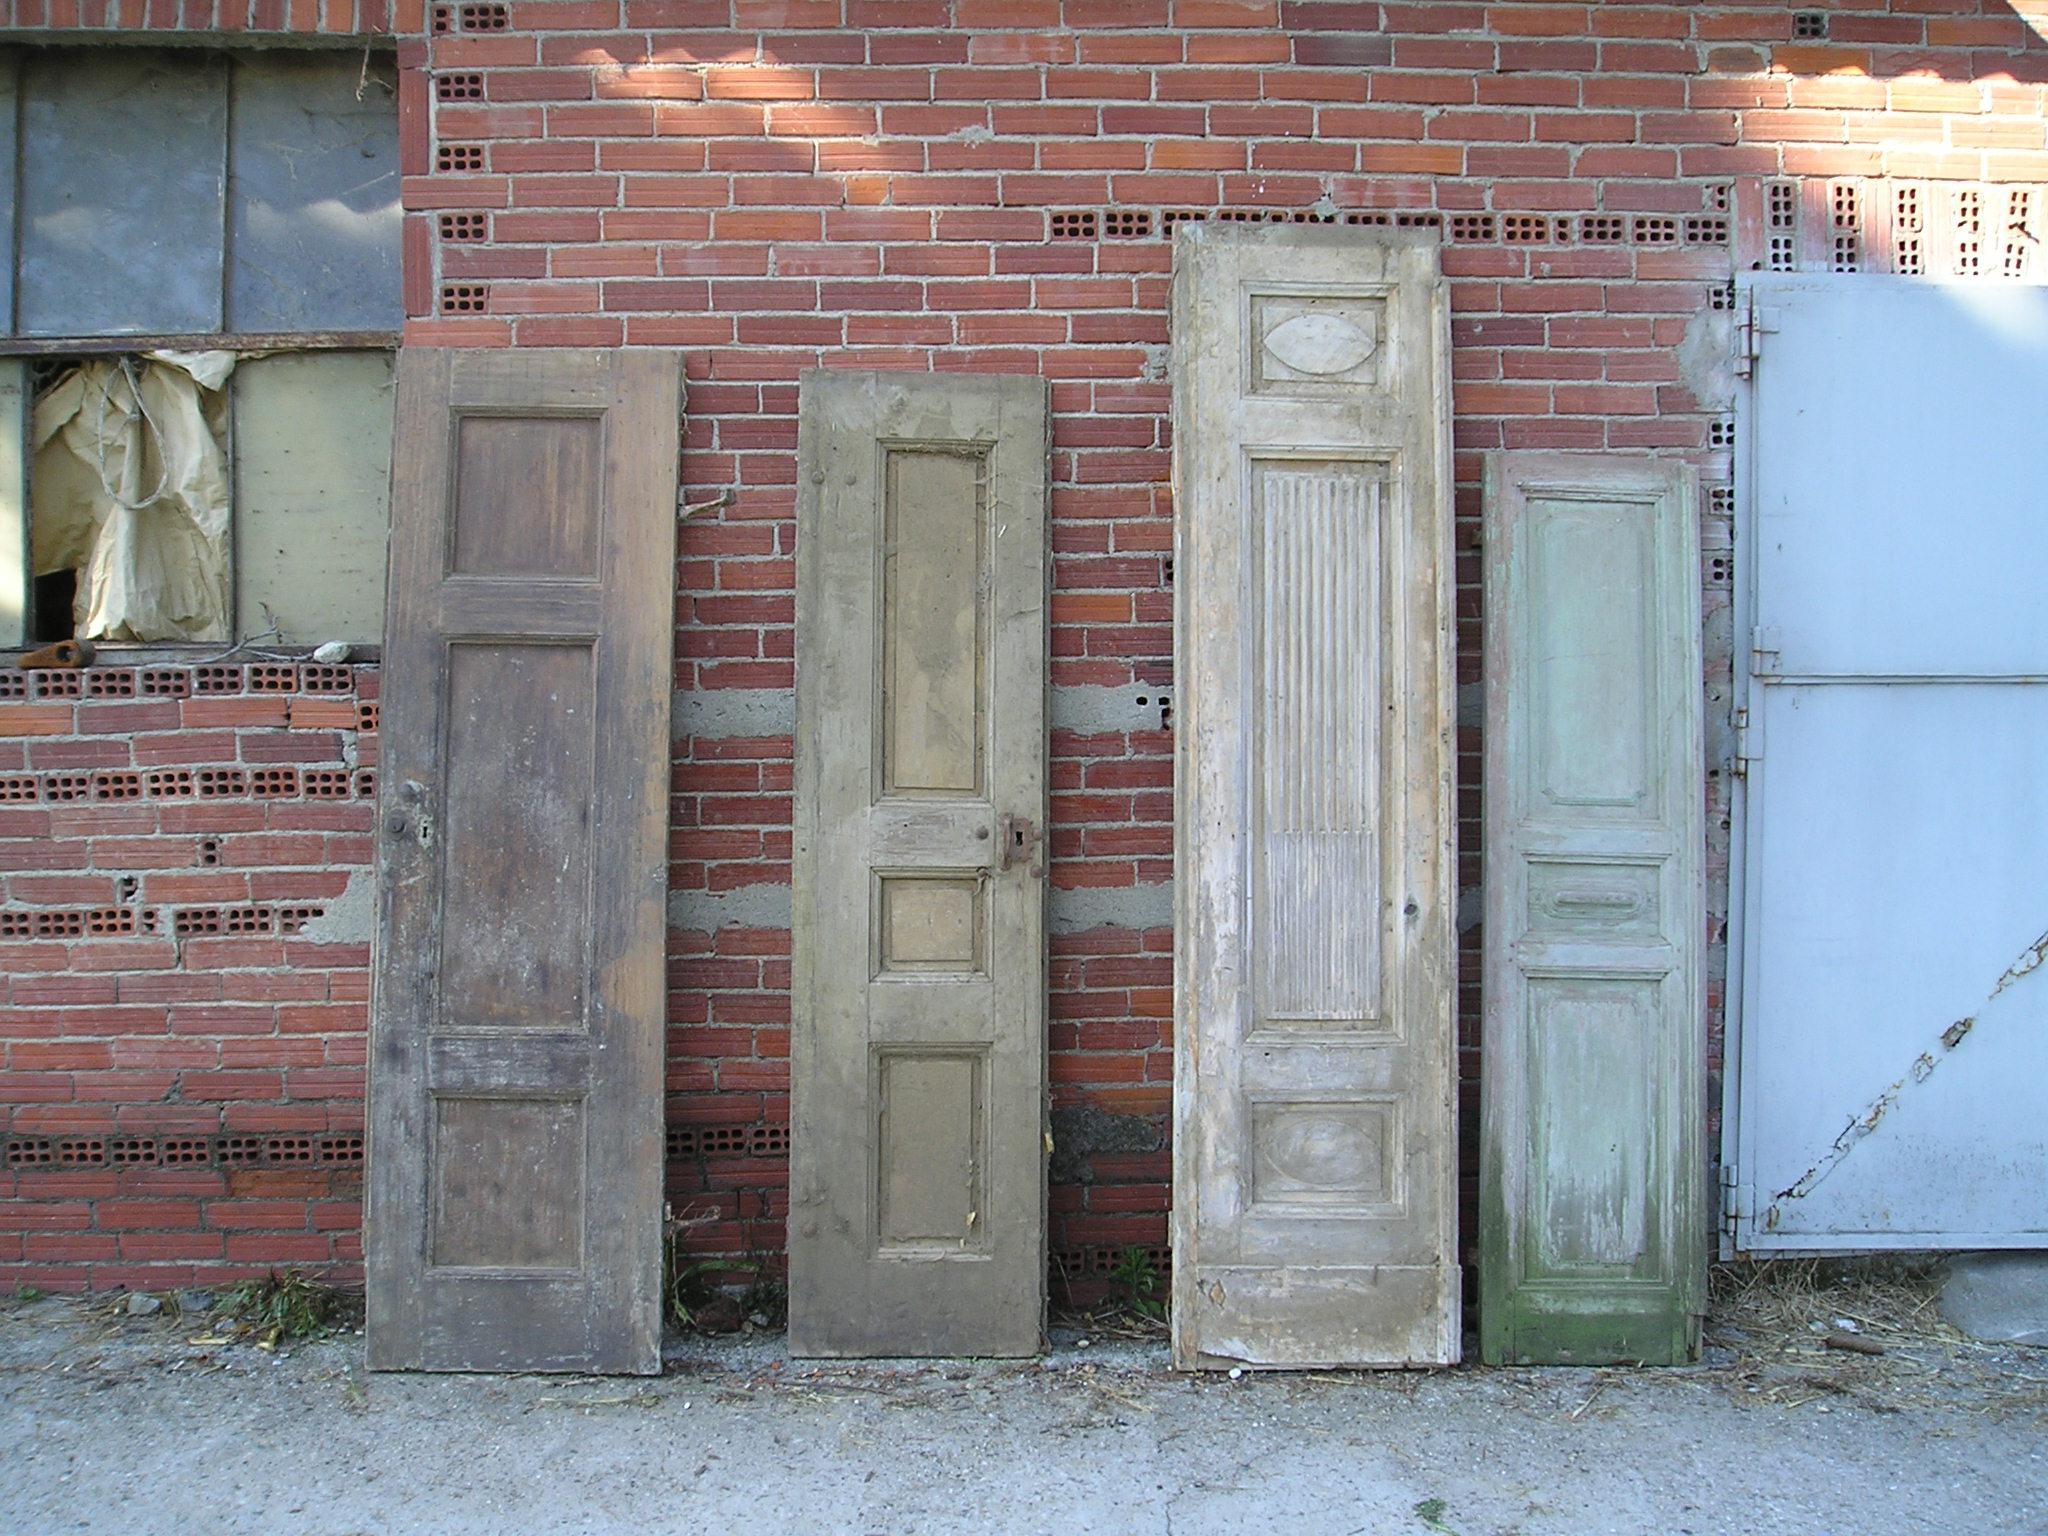 Porte antiche riproduzioni o originali restaurate